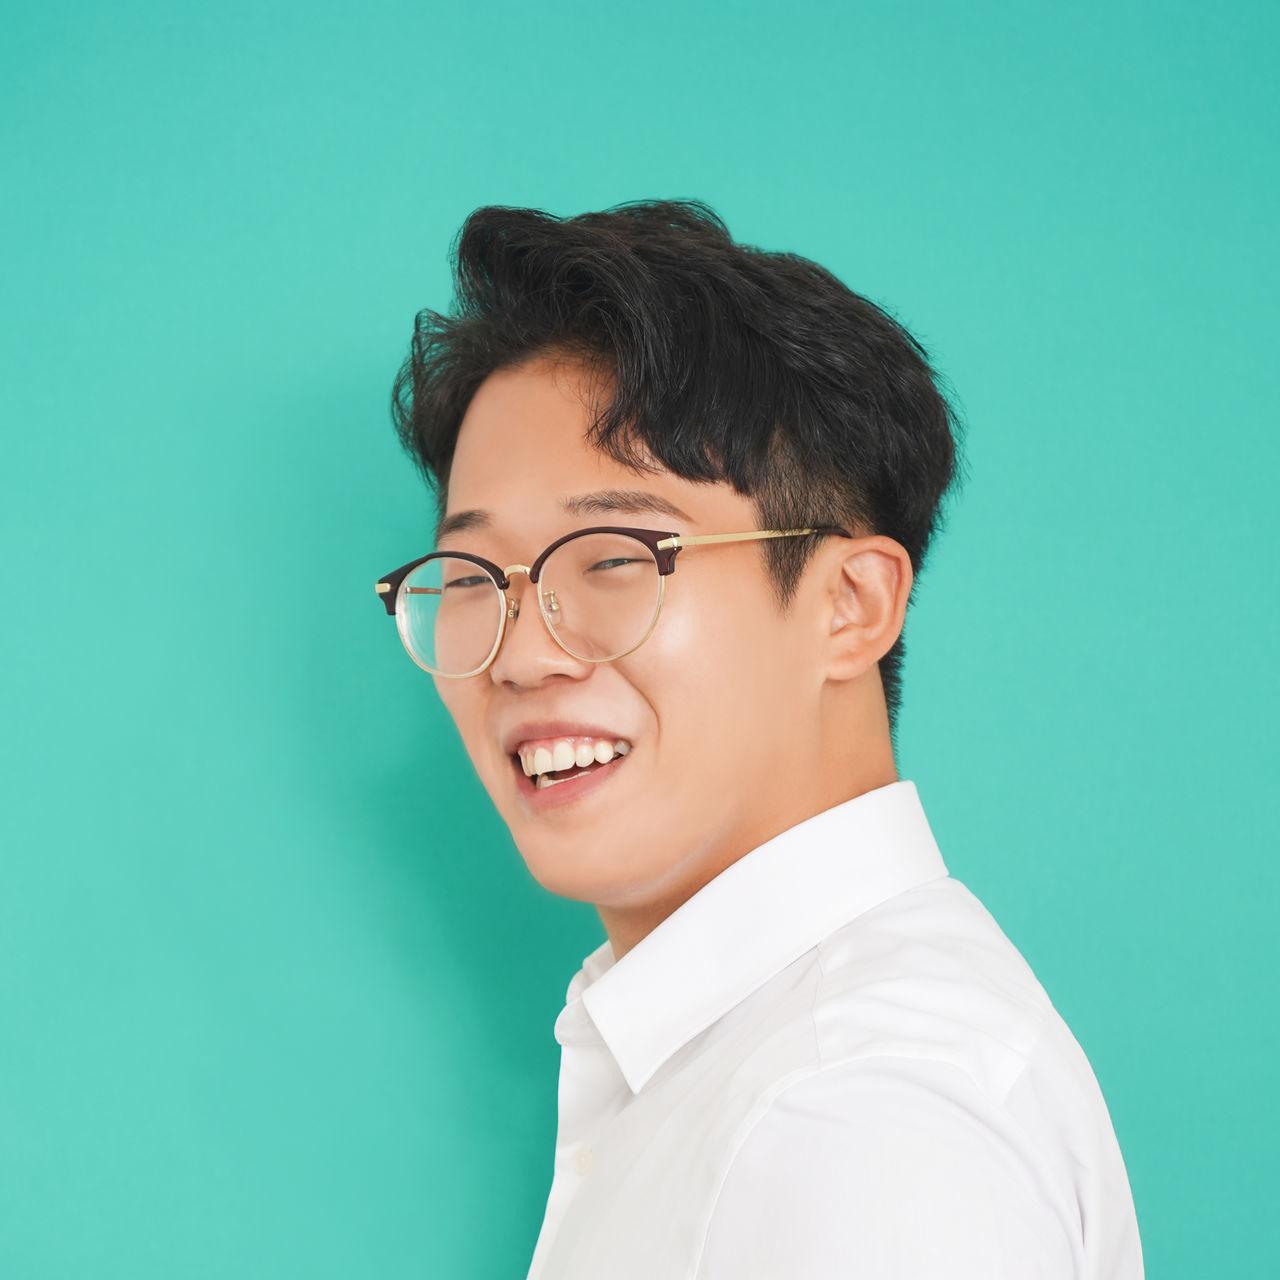 <b>Oh Ji Suk</b><br>Lead Fundraiser<br>